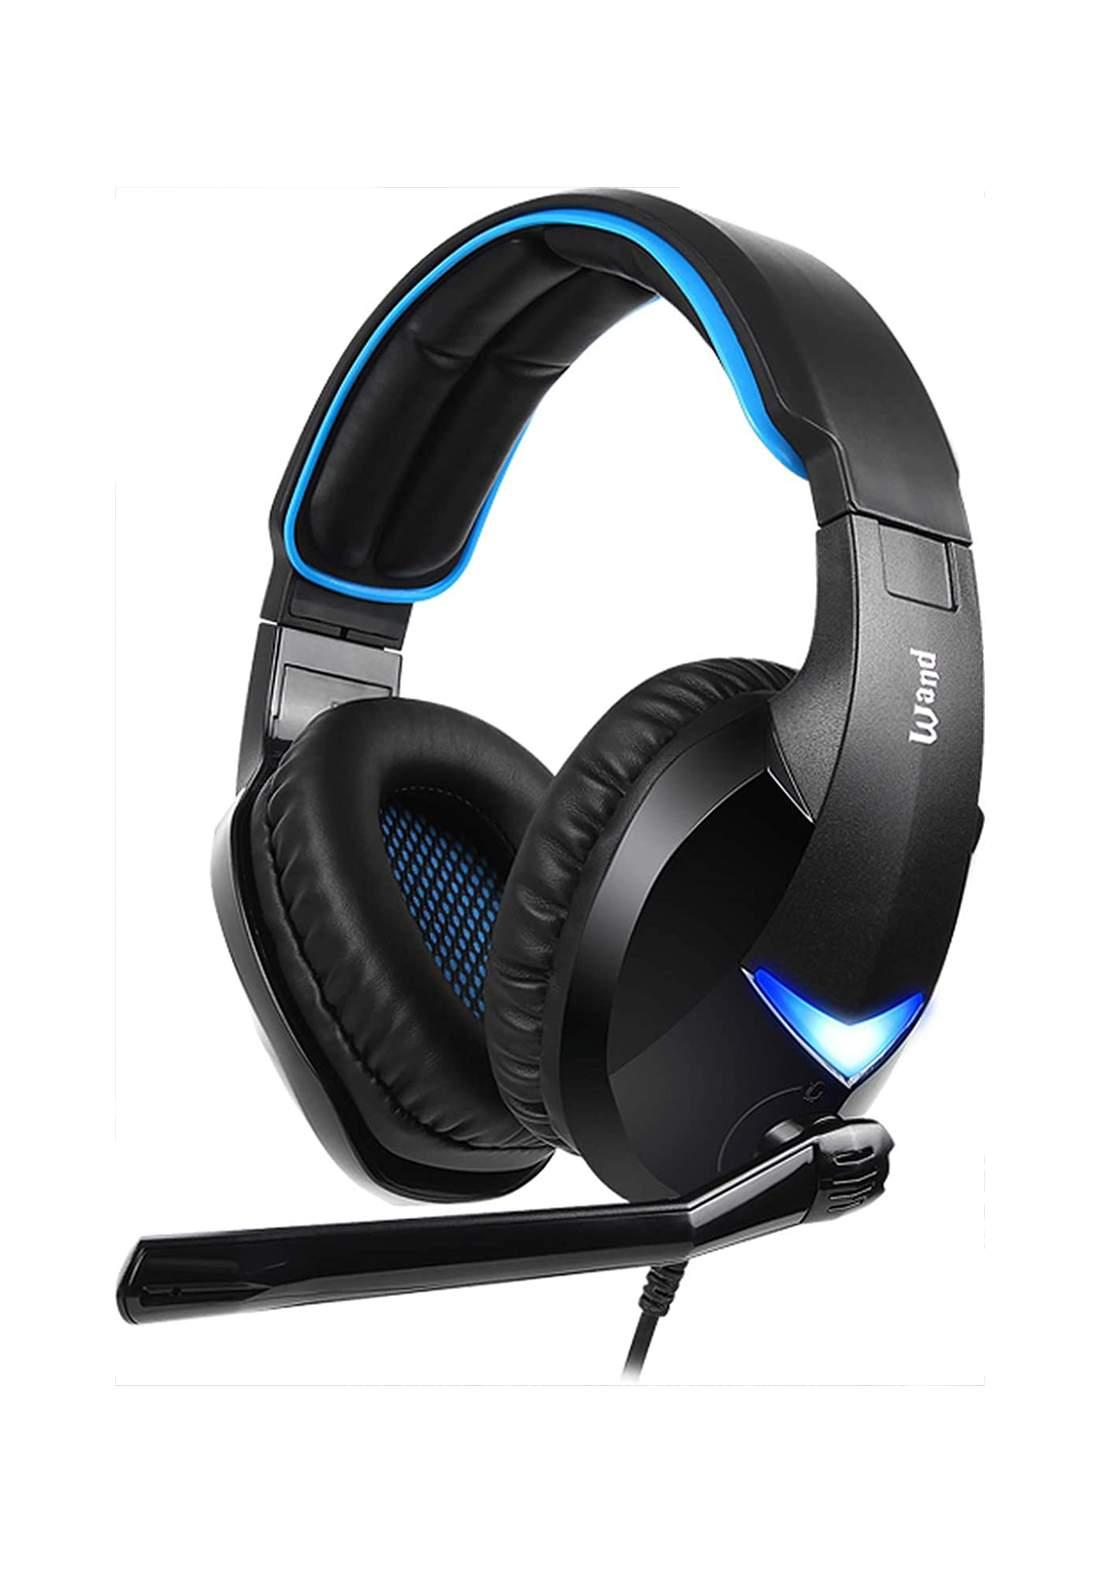 SADES Wand Gaming Headphones سماعة